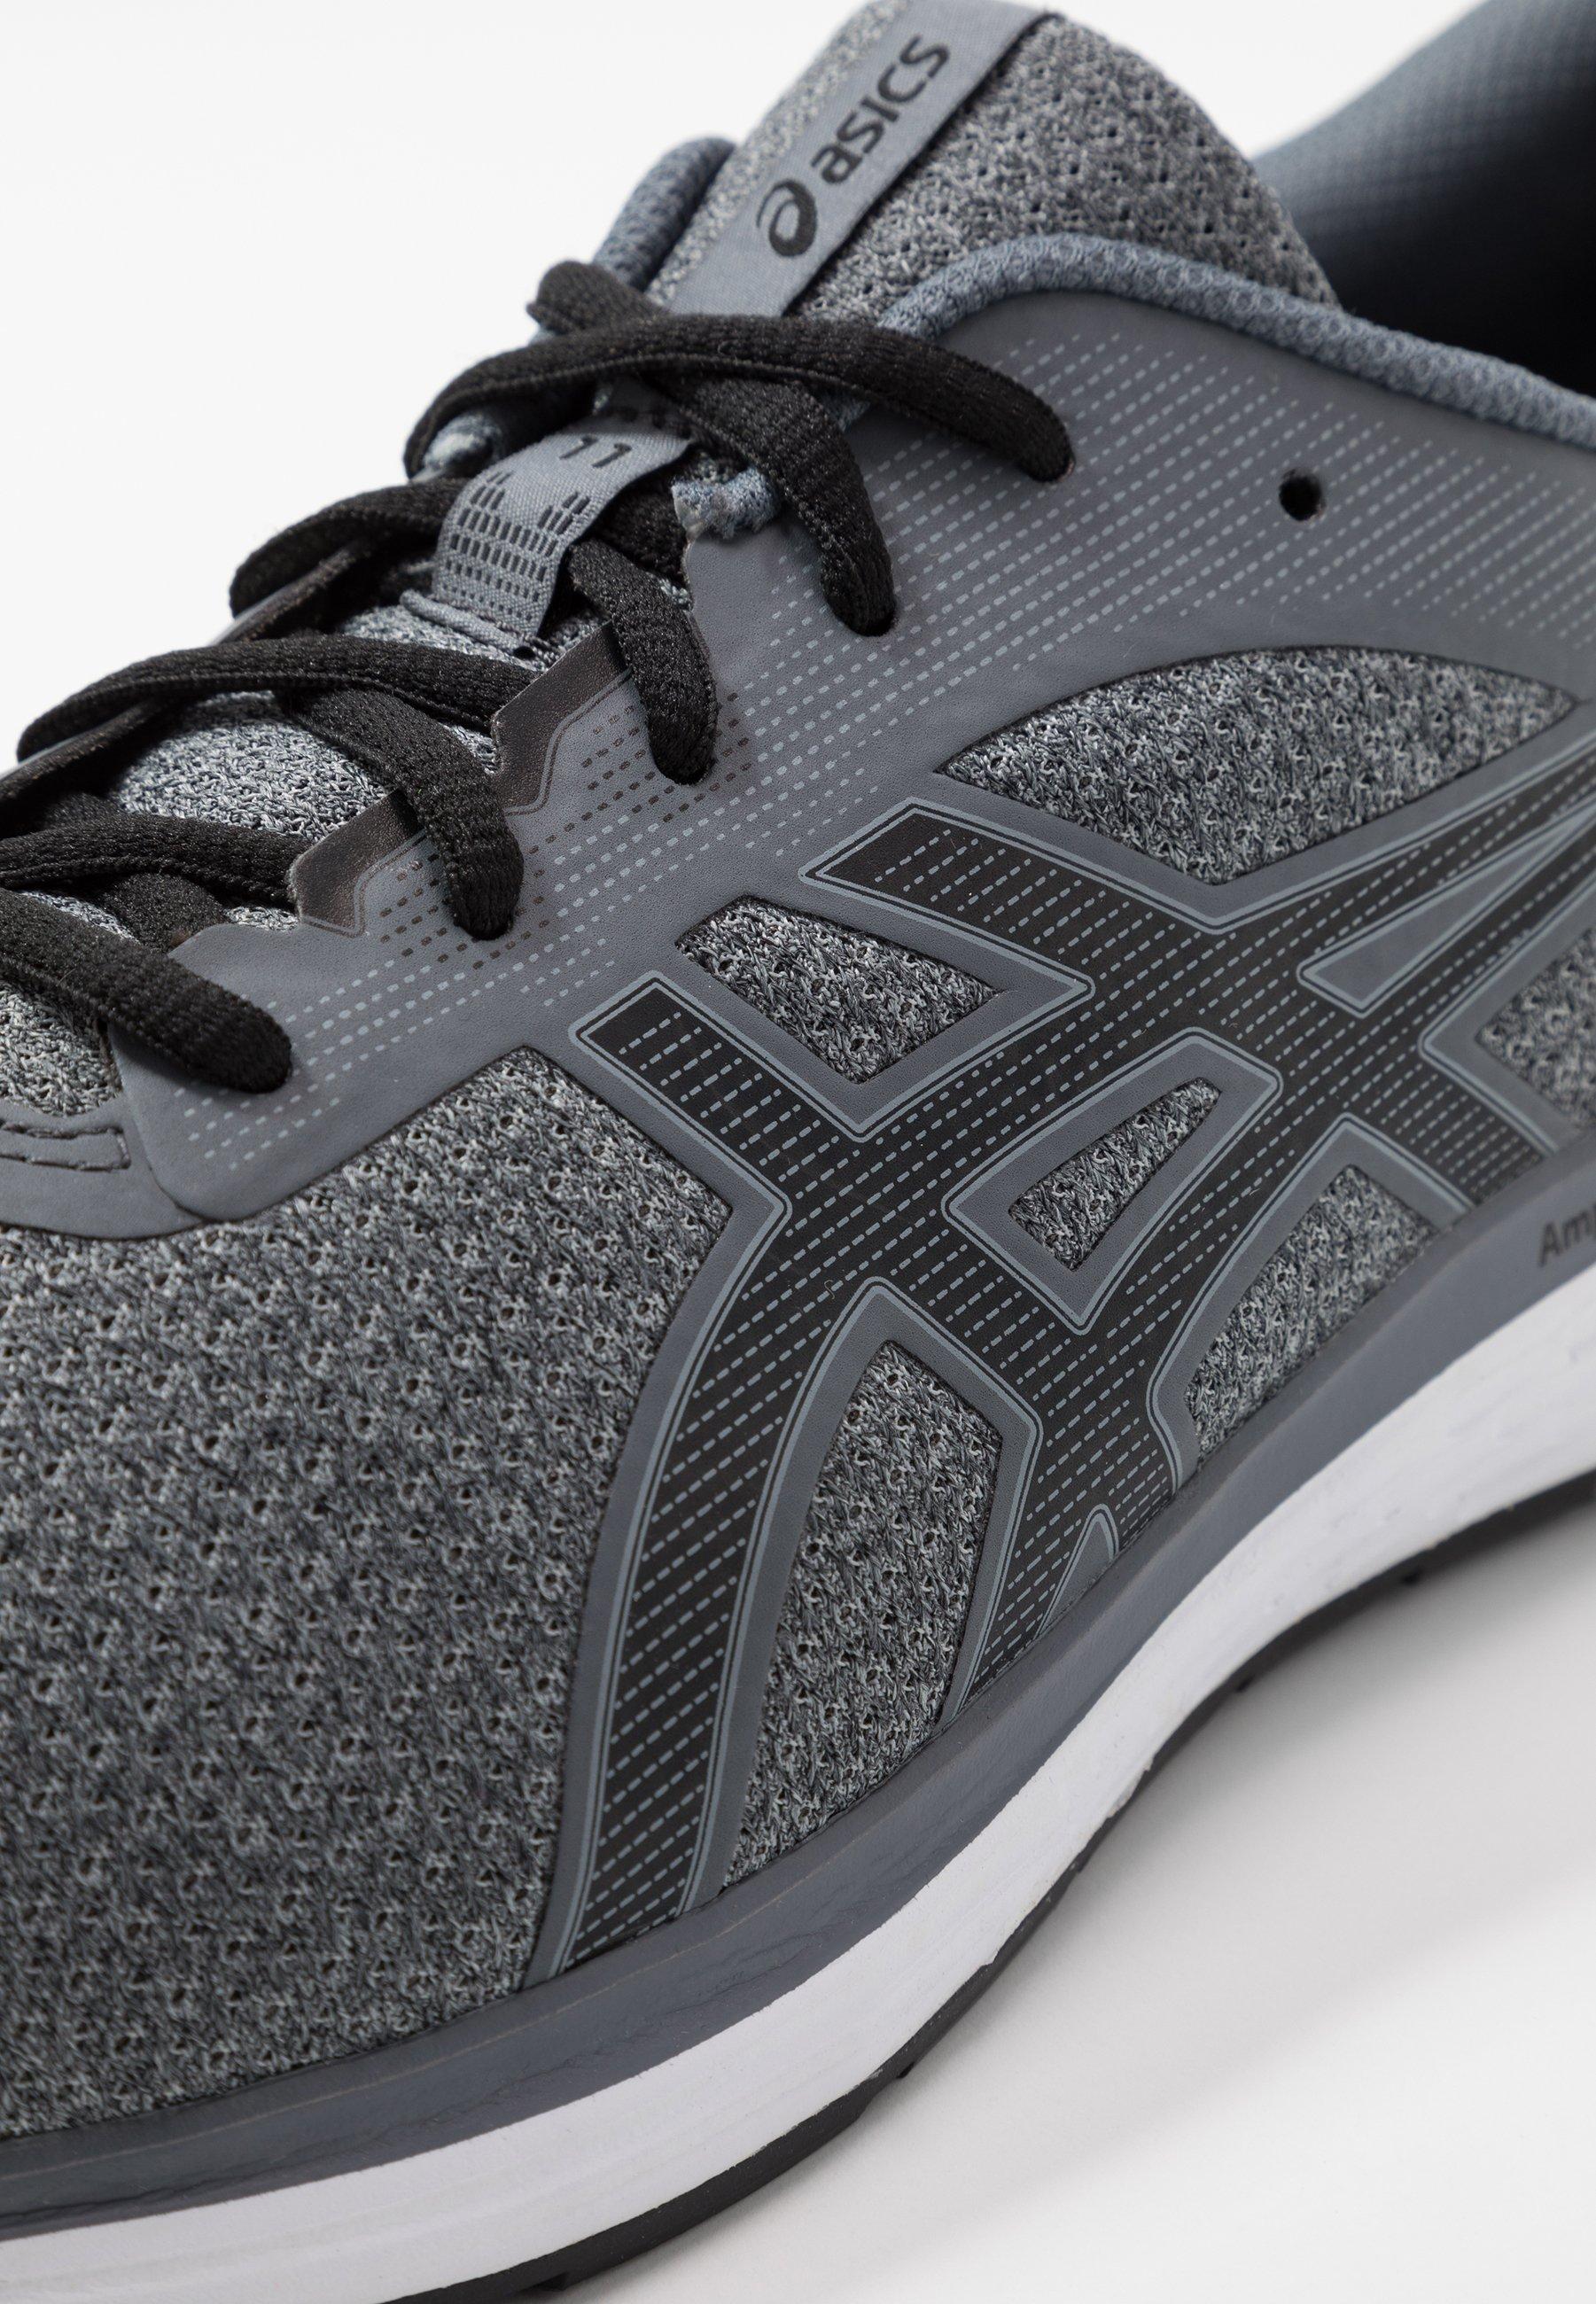 Asics Patriot 11 Twist - Neutral Running Shoes Piedmont Grey/black